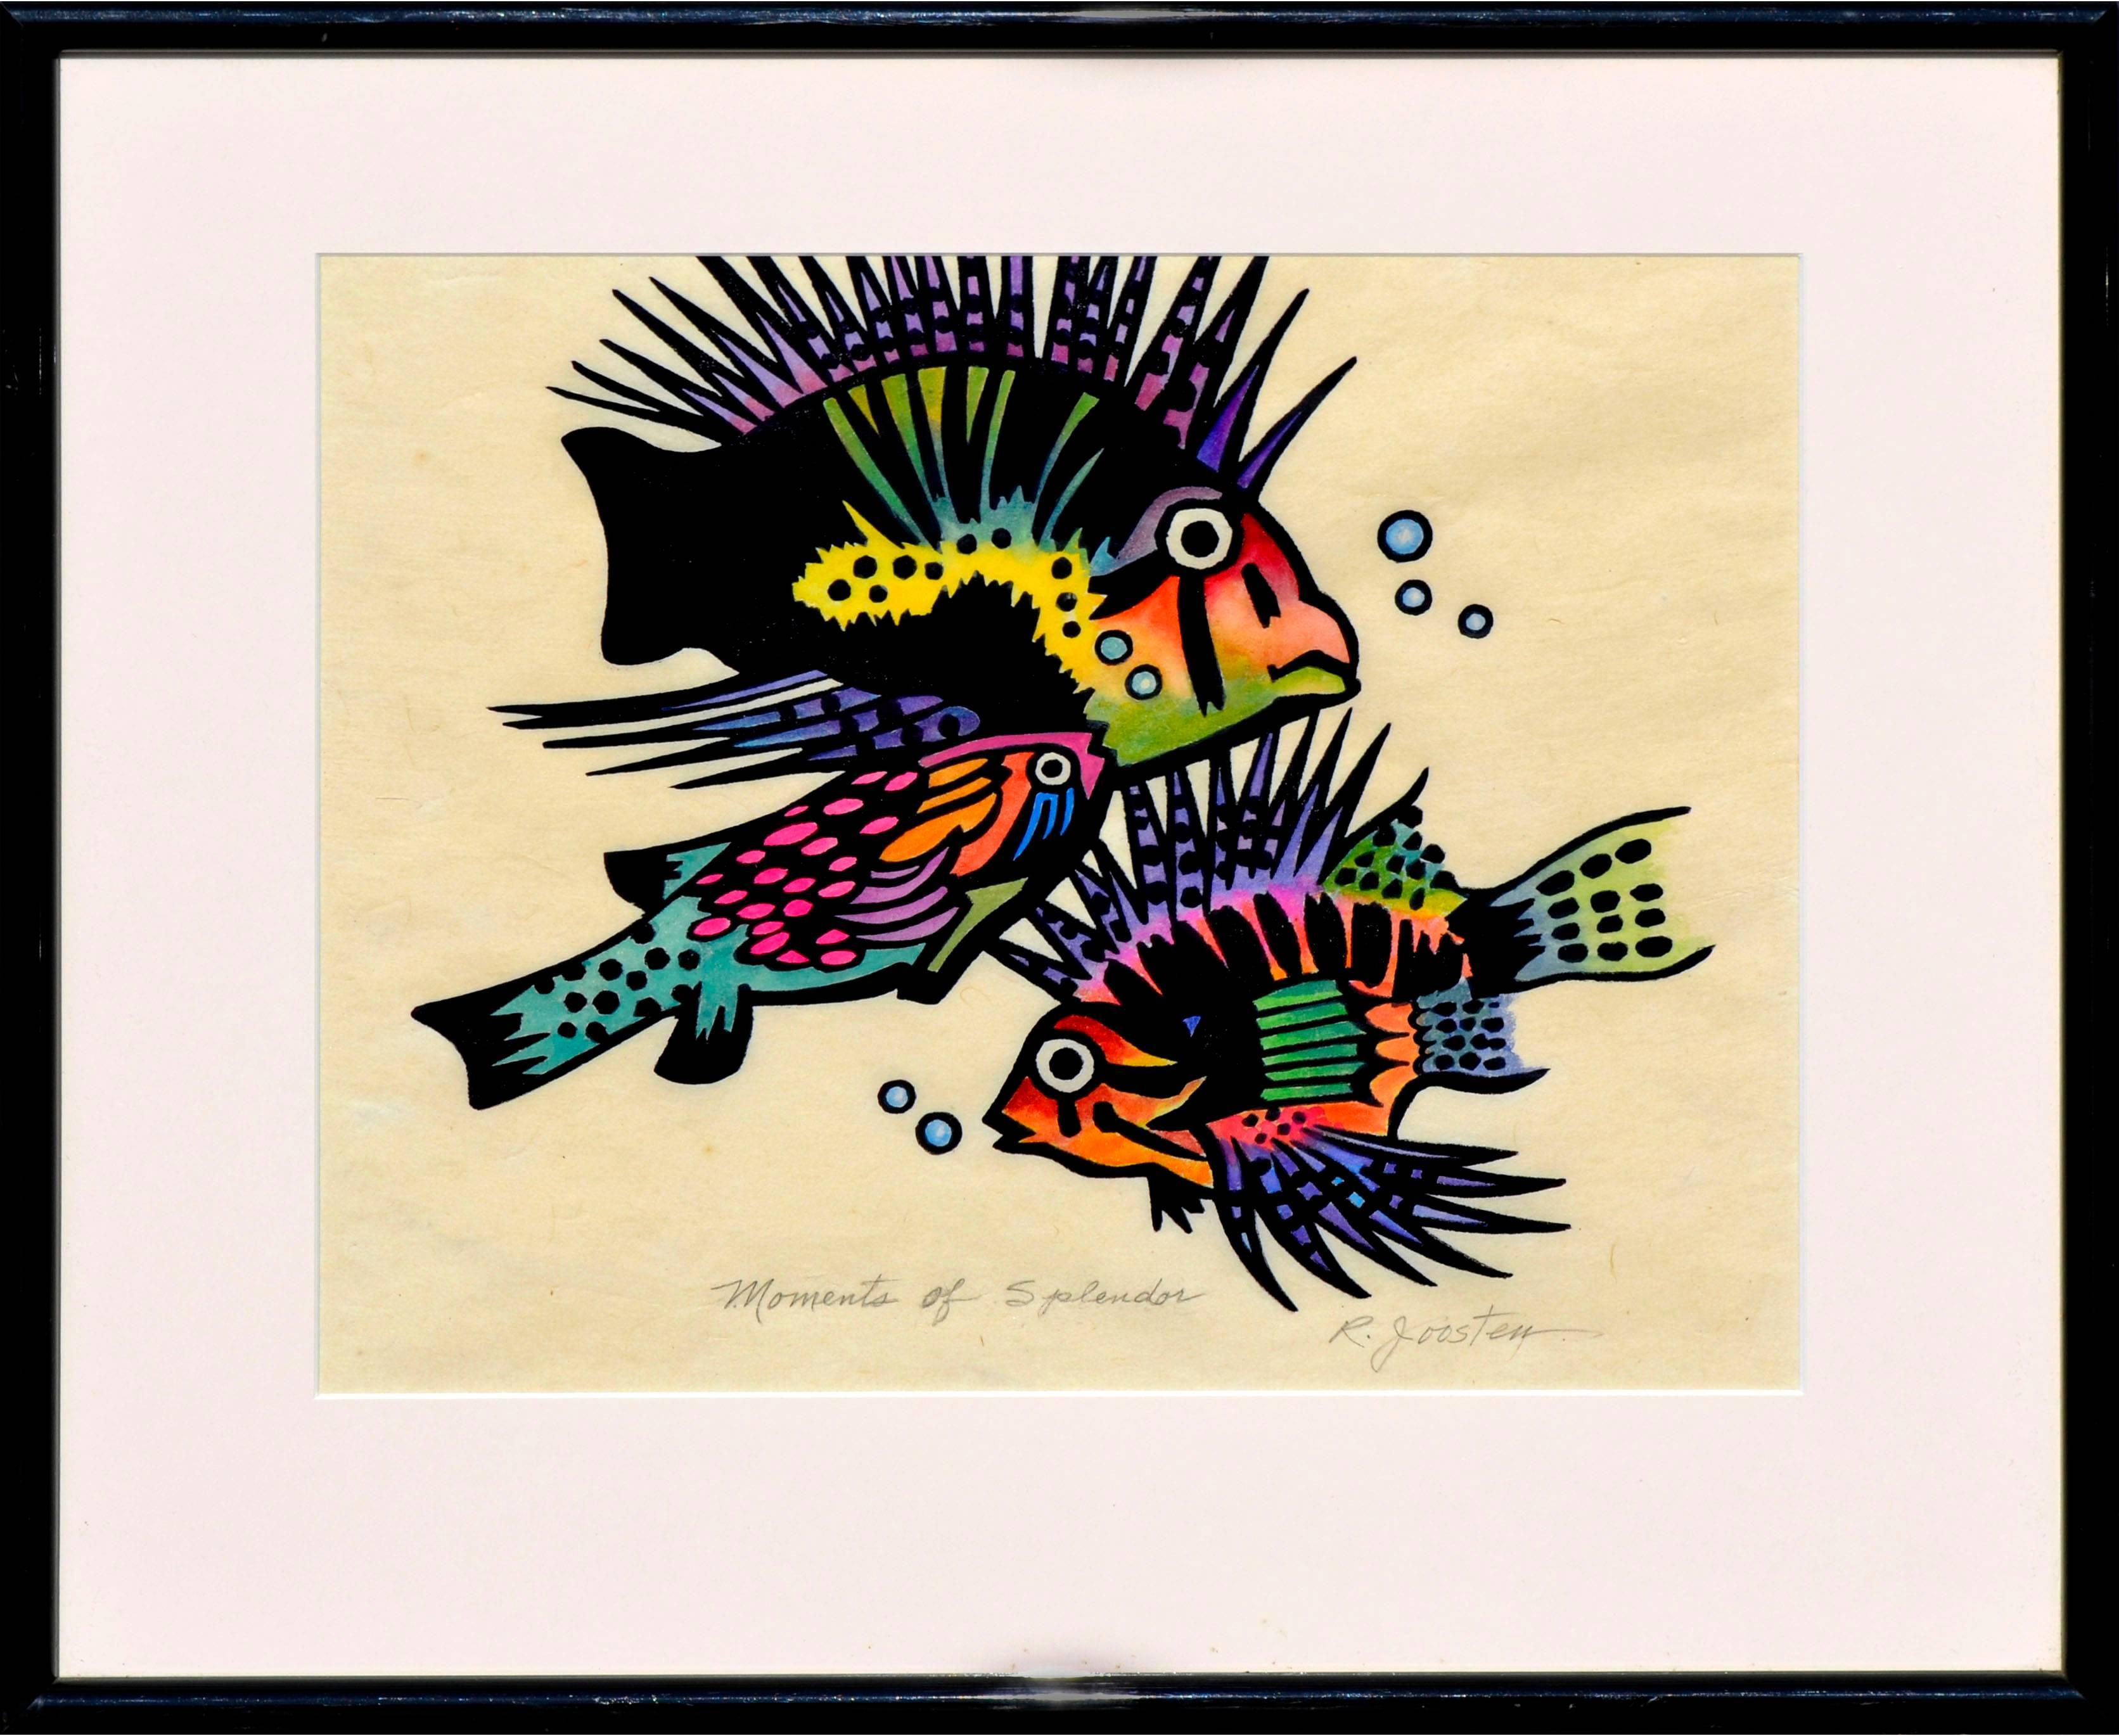 Fauvist Fish -- Moments of Splendor